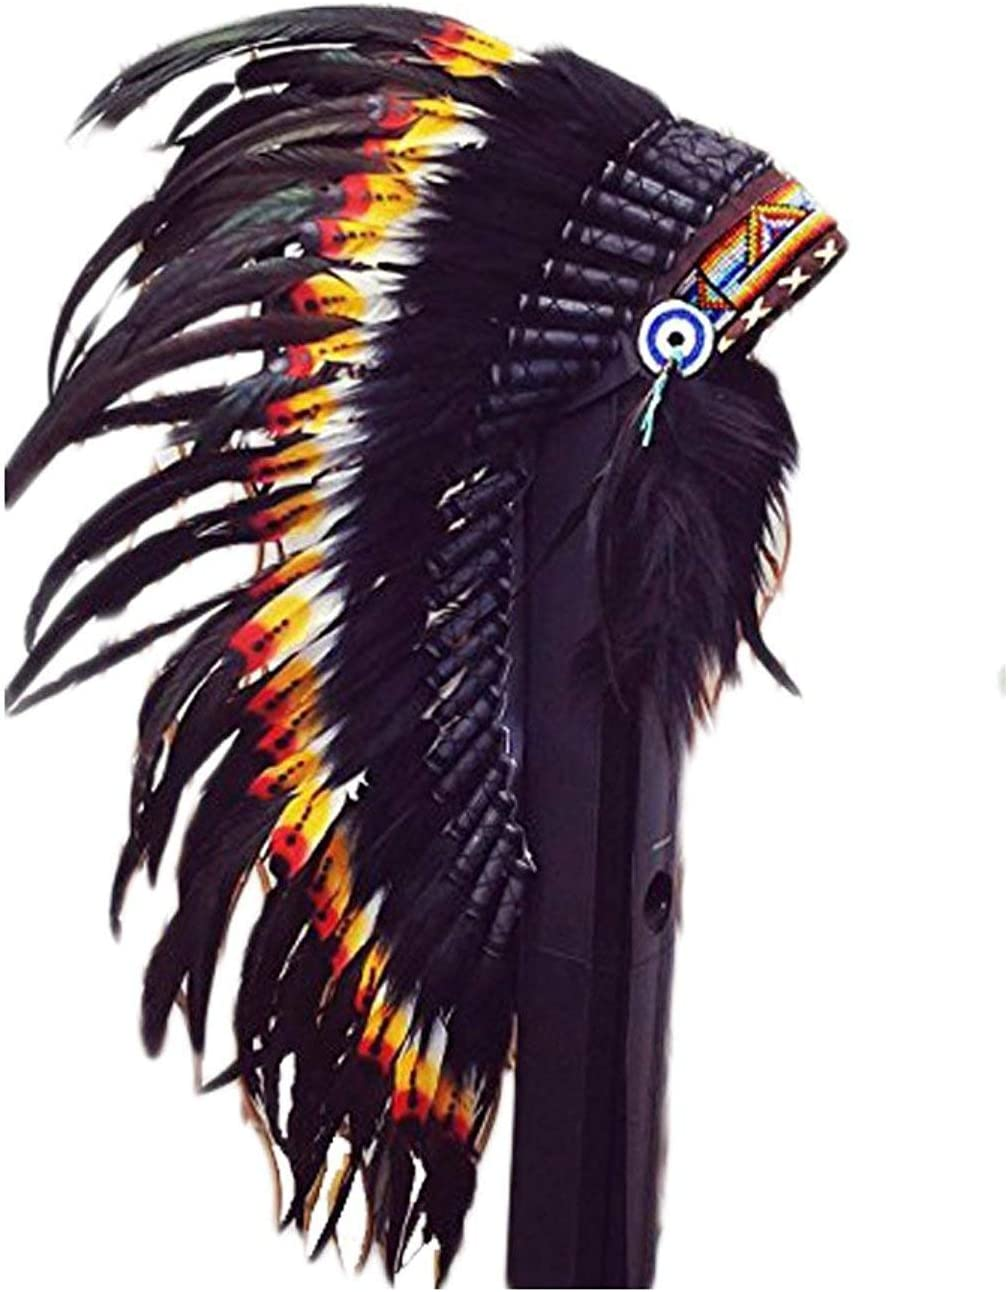 //War Bonnet 36 inch Long KARMABCN Native American Inspired Medium Feather Headdress